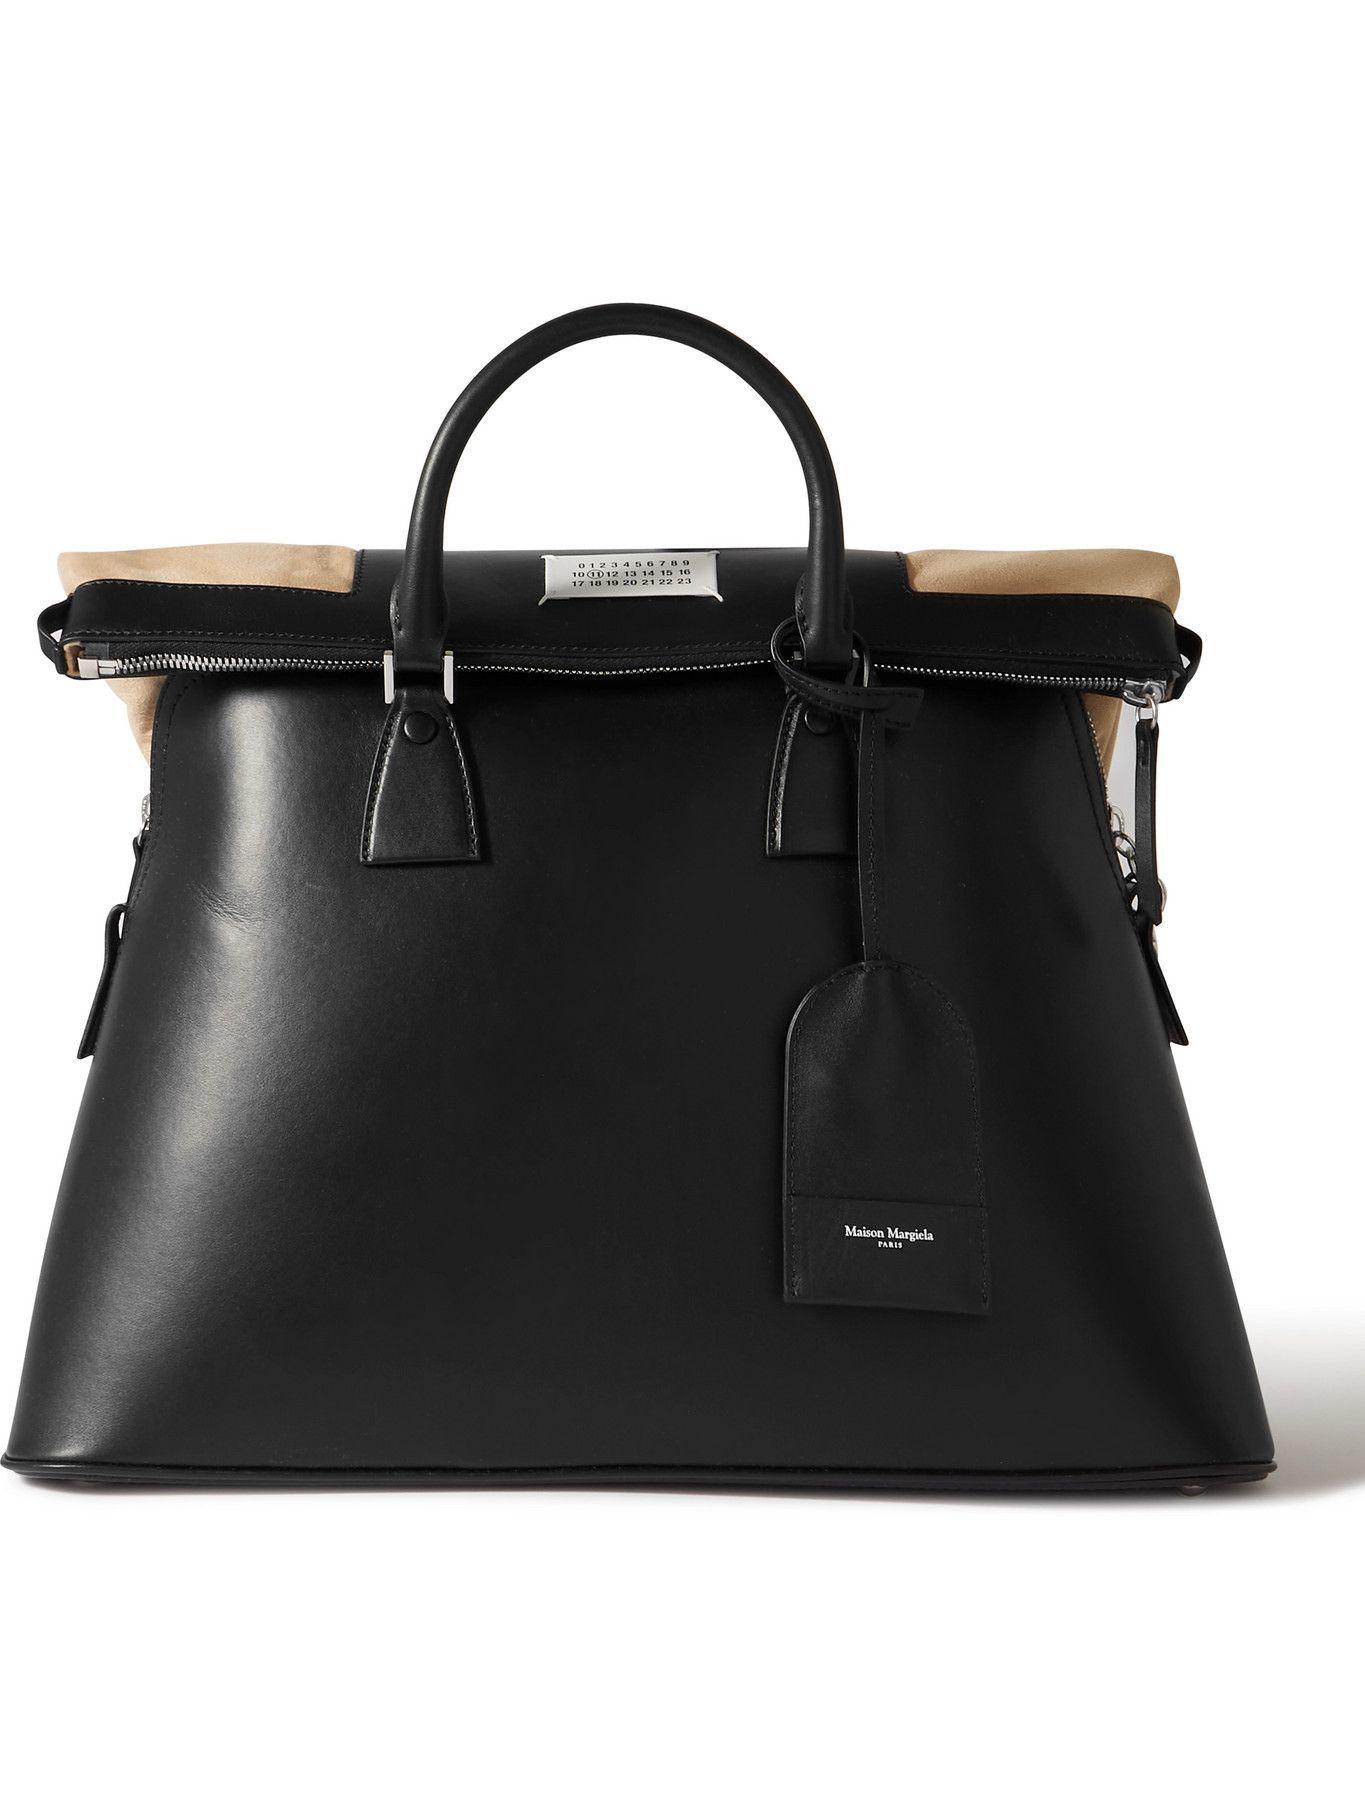 Photo: Maison Margiela - 5AC Logo-Appliquéd Leather and Suede Tote Bag